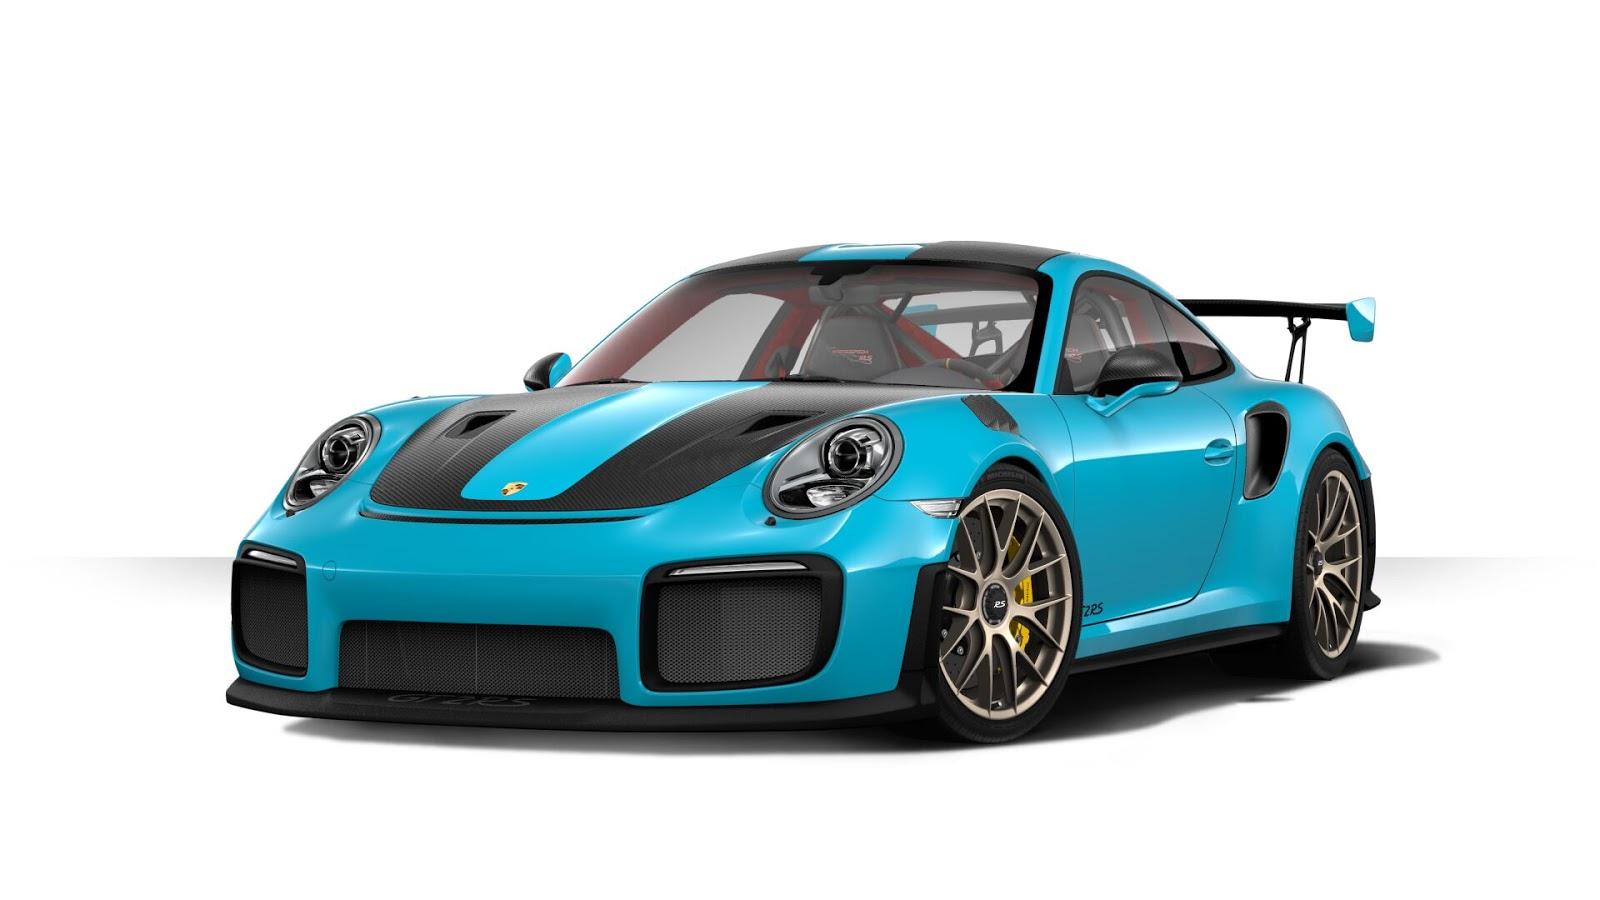 Tuner Car Wallpaper Hd Porsche 911 Gt2 Rs Configurator Lets You Design Your Final